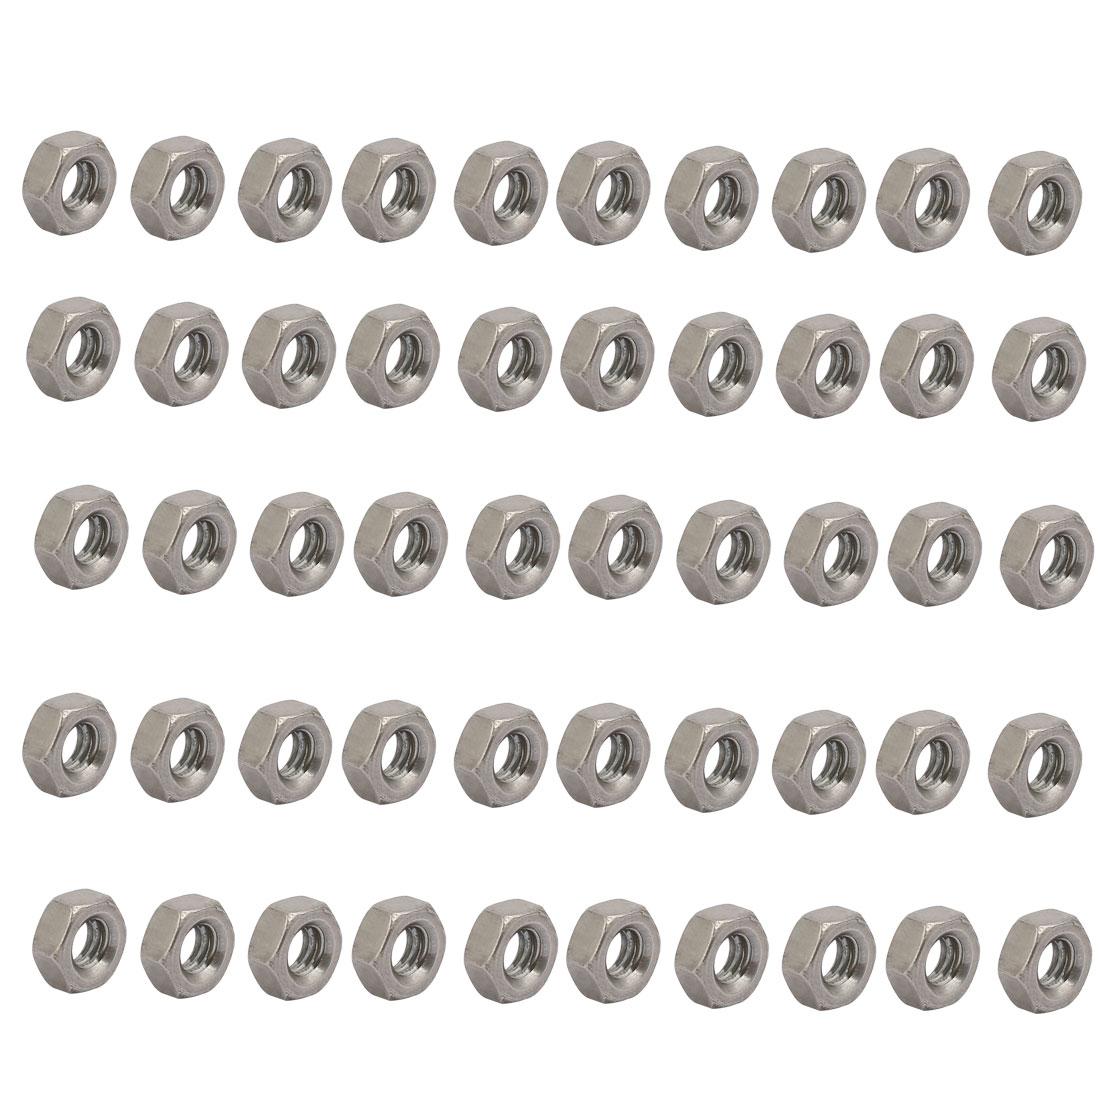 "50pcs 5/32""-32 BSW Thread 304 Stainless Steel Hex Nut Fastener Silver Tone"